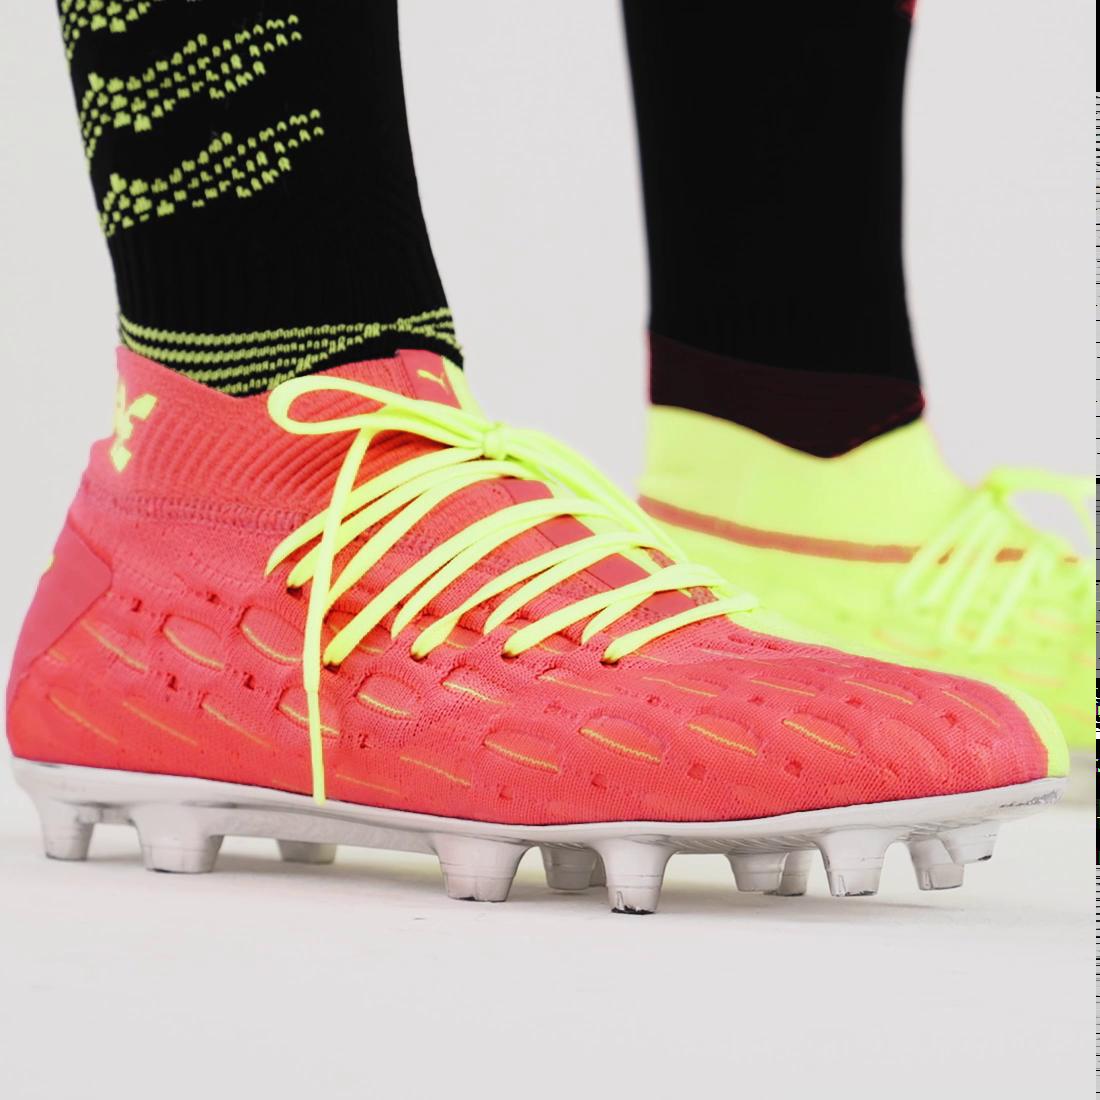 Image PUMA FUTURE 5.1 NETFIT FG/AG Men's Football Boots #9